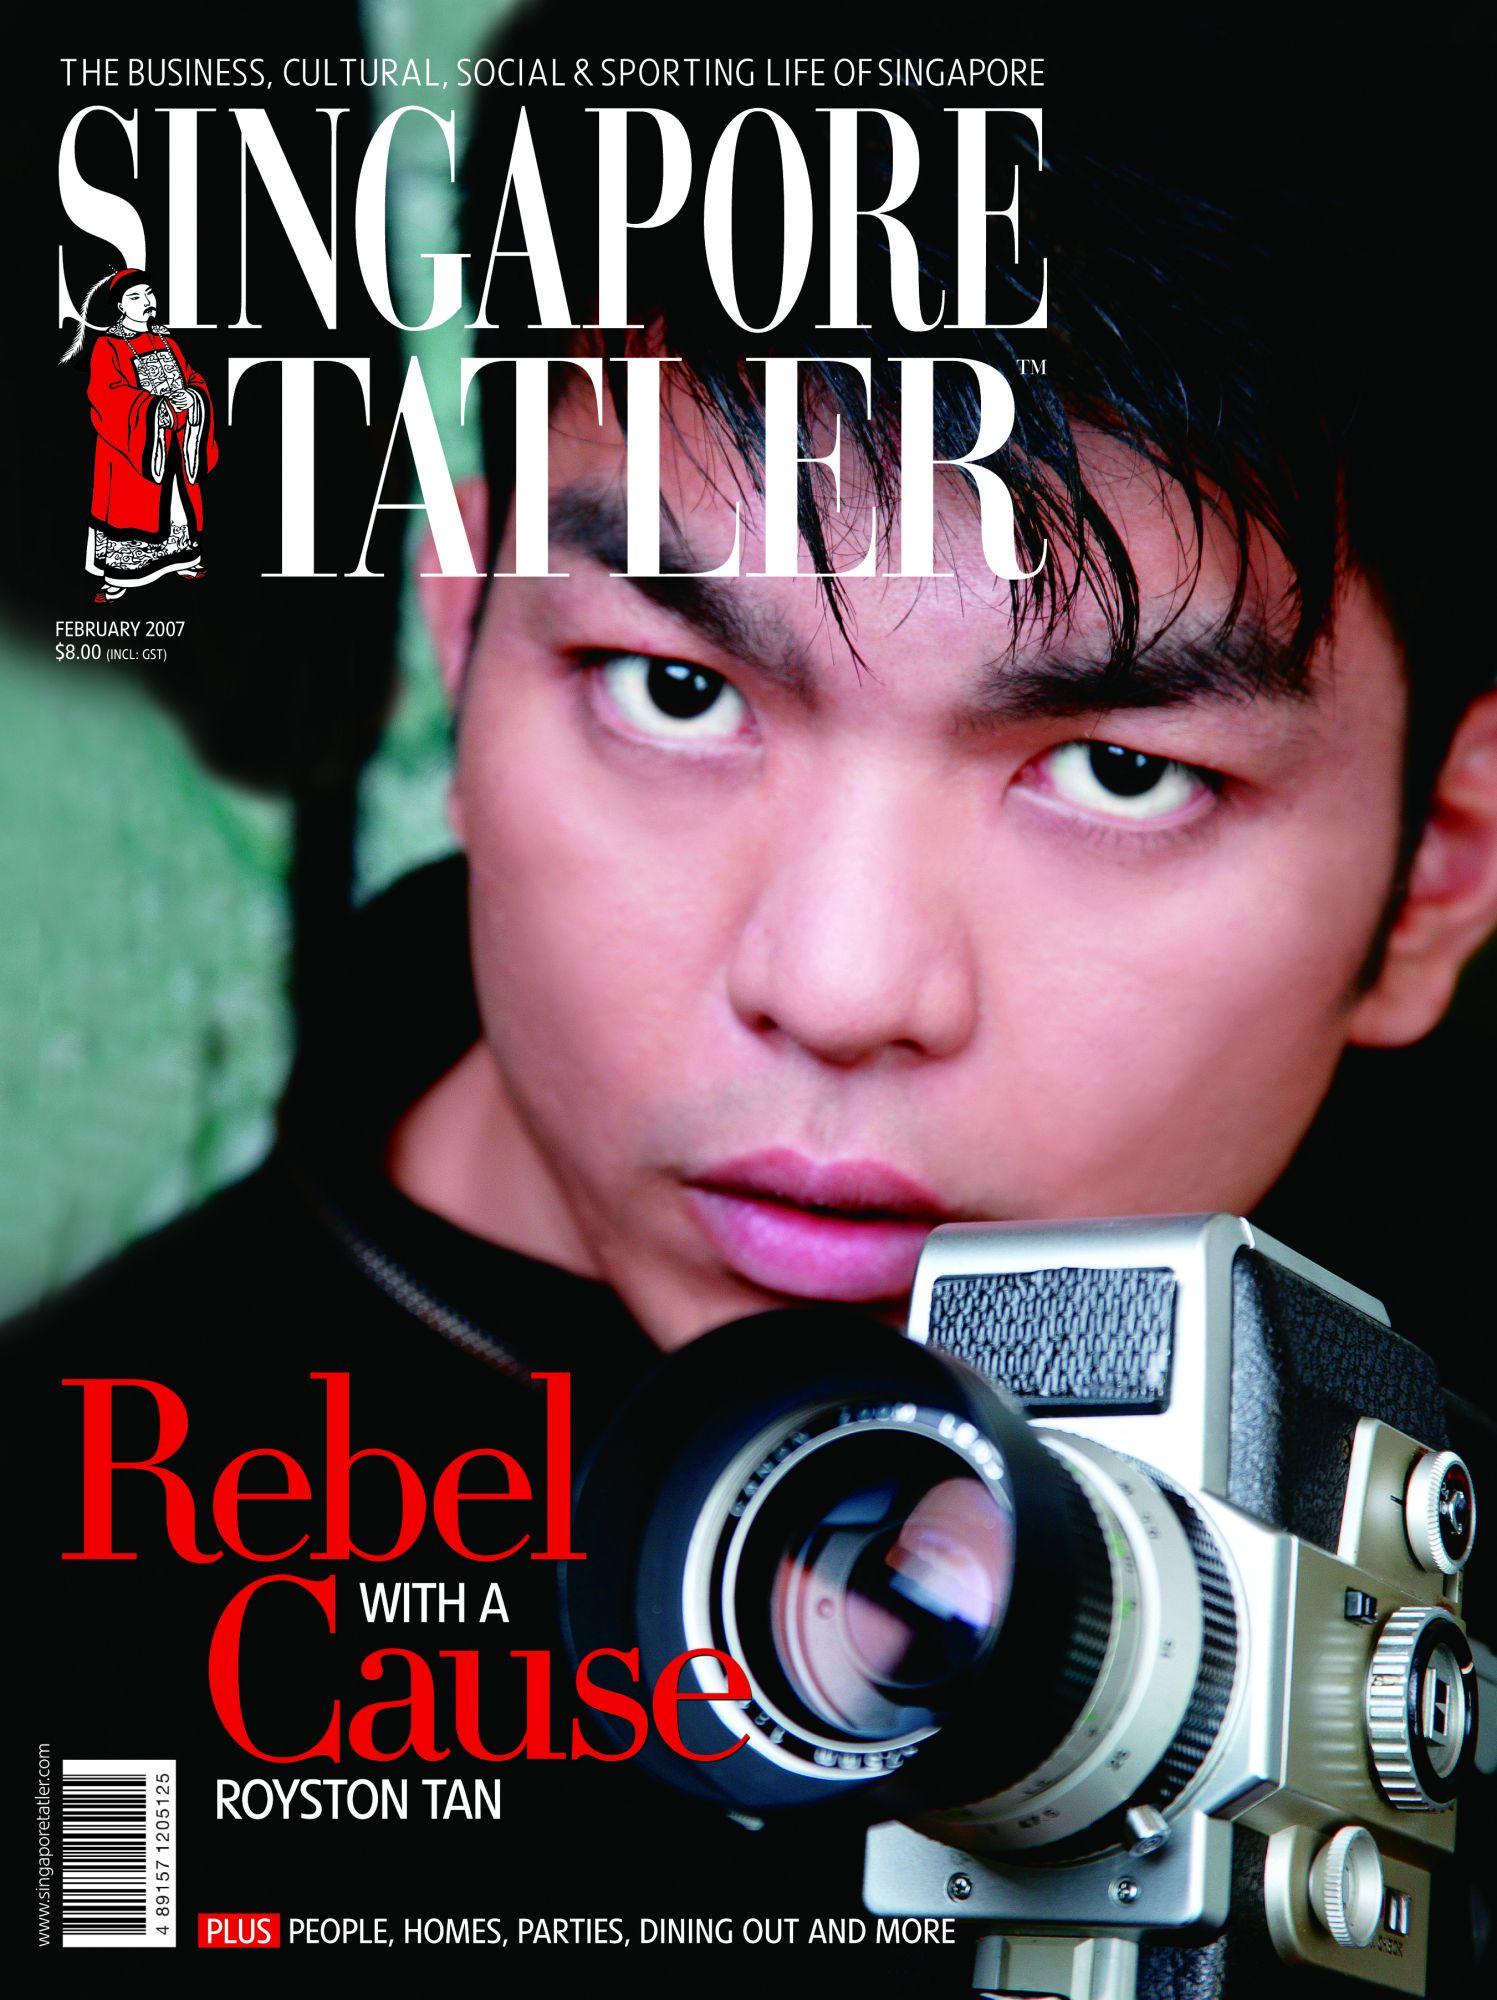 Royston Tan (Feb 2007)